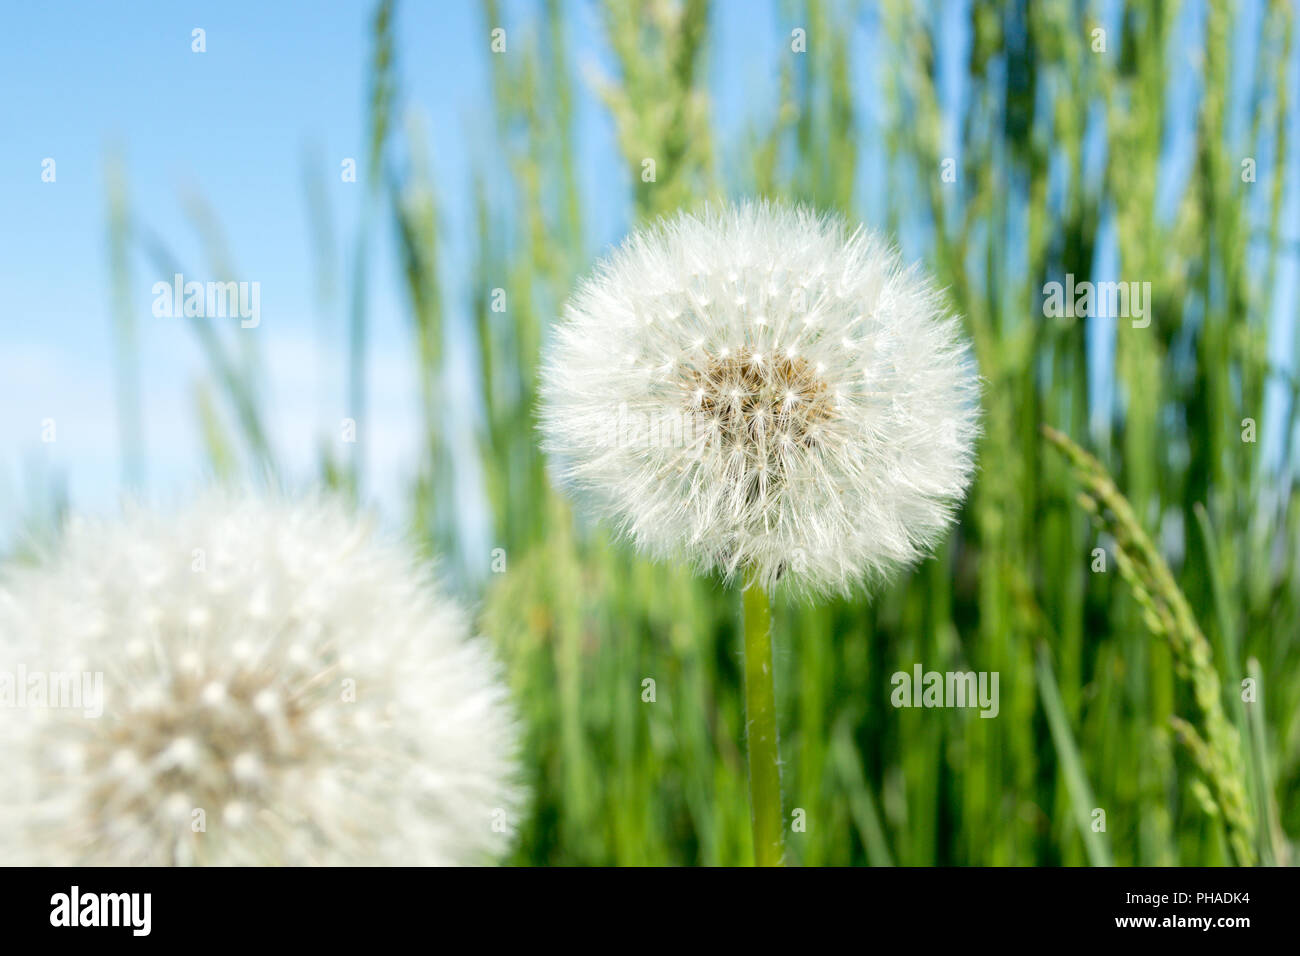 Dandelion fluff. Dandelion tranquil abstract closeup art background - Stock Image